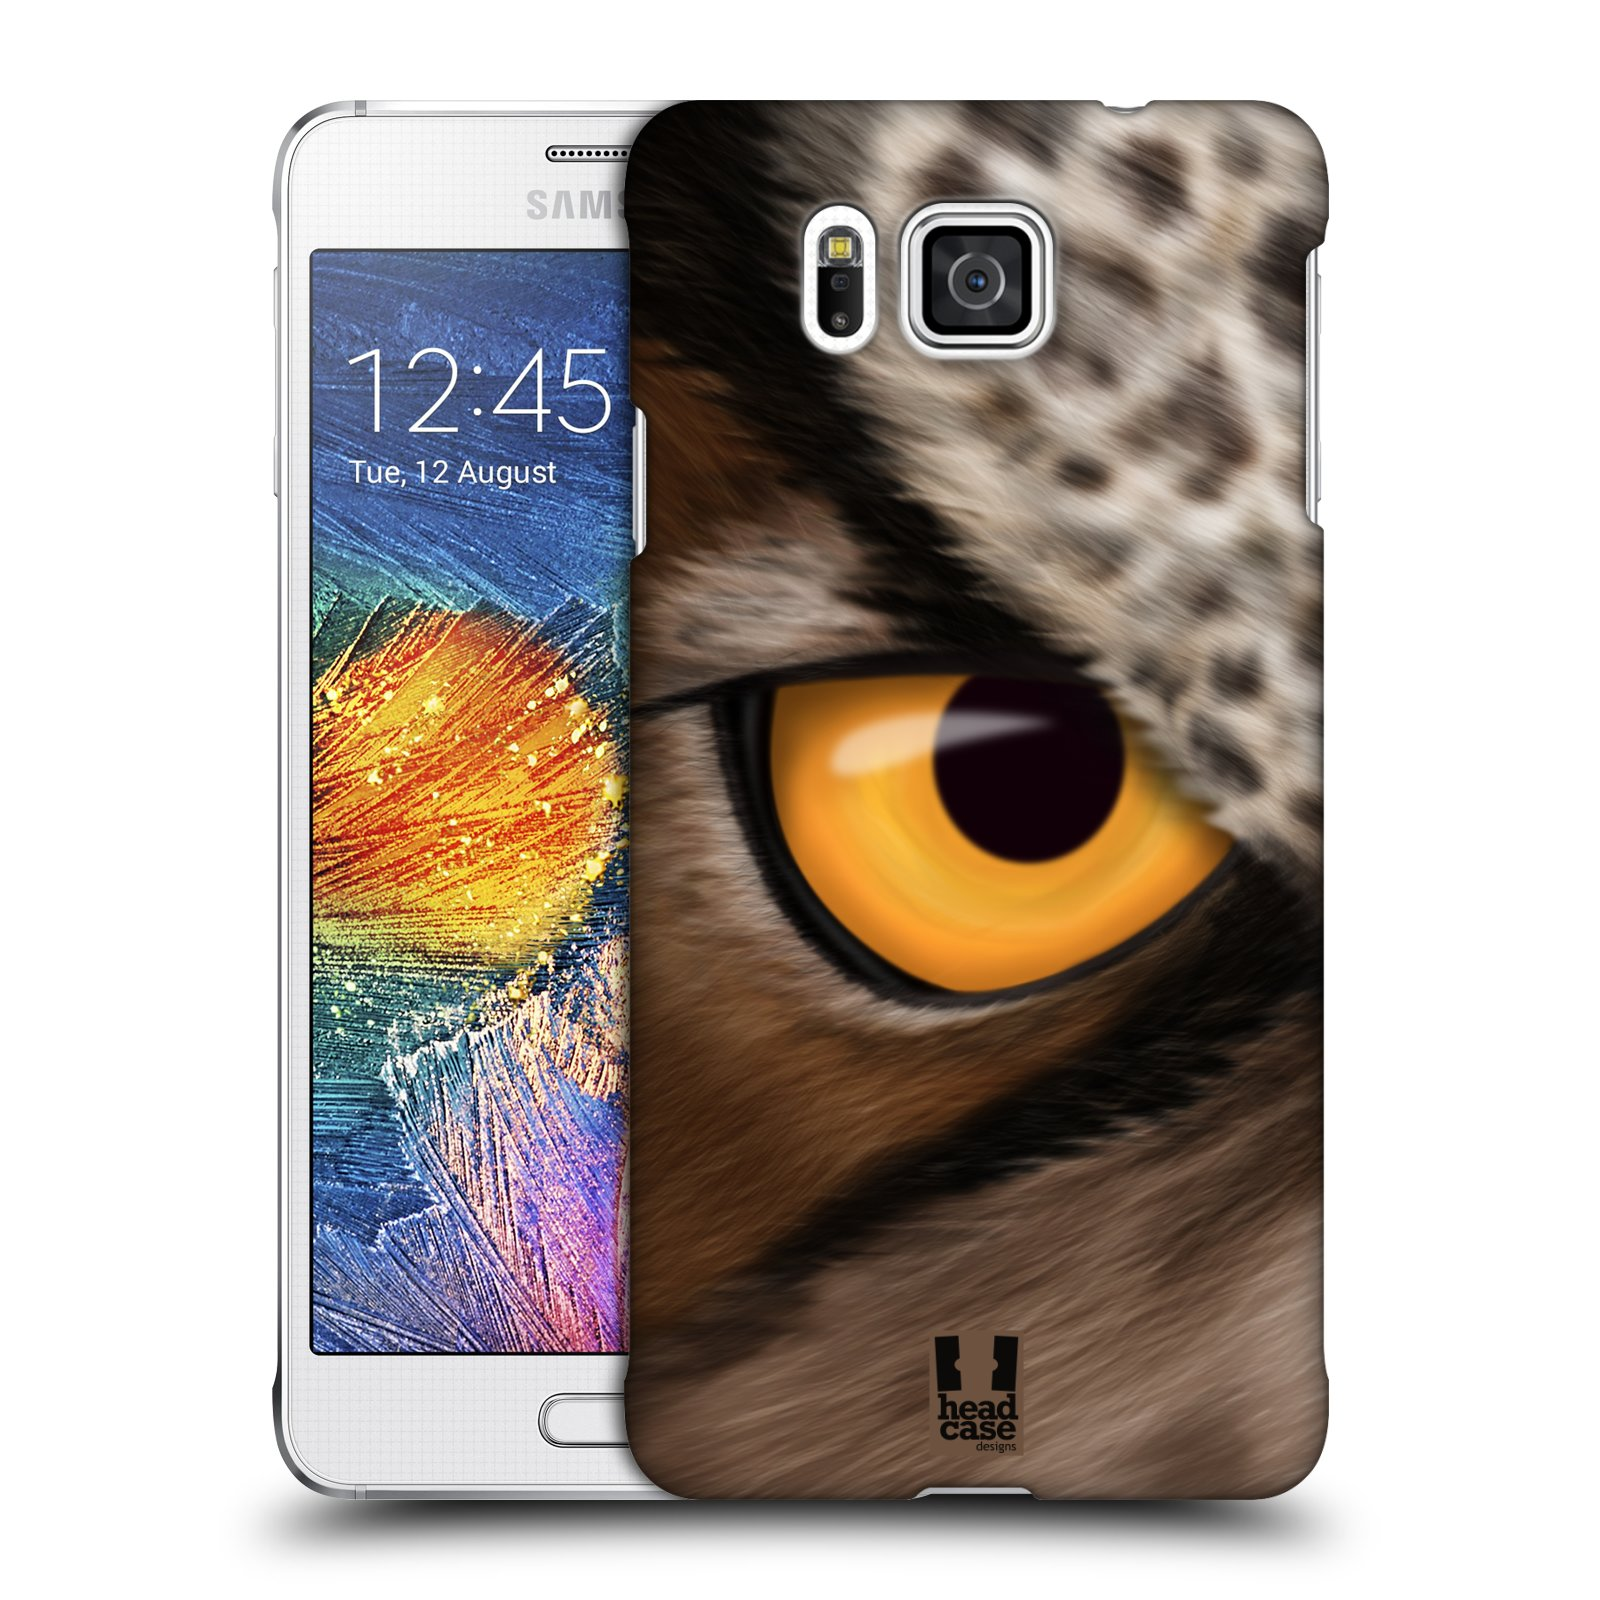 HEAD CASE plastový obal na mobil SAMSUNG Galaxy Alpha (G850) vzor pohled zvířete oko sova